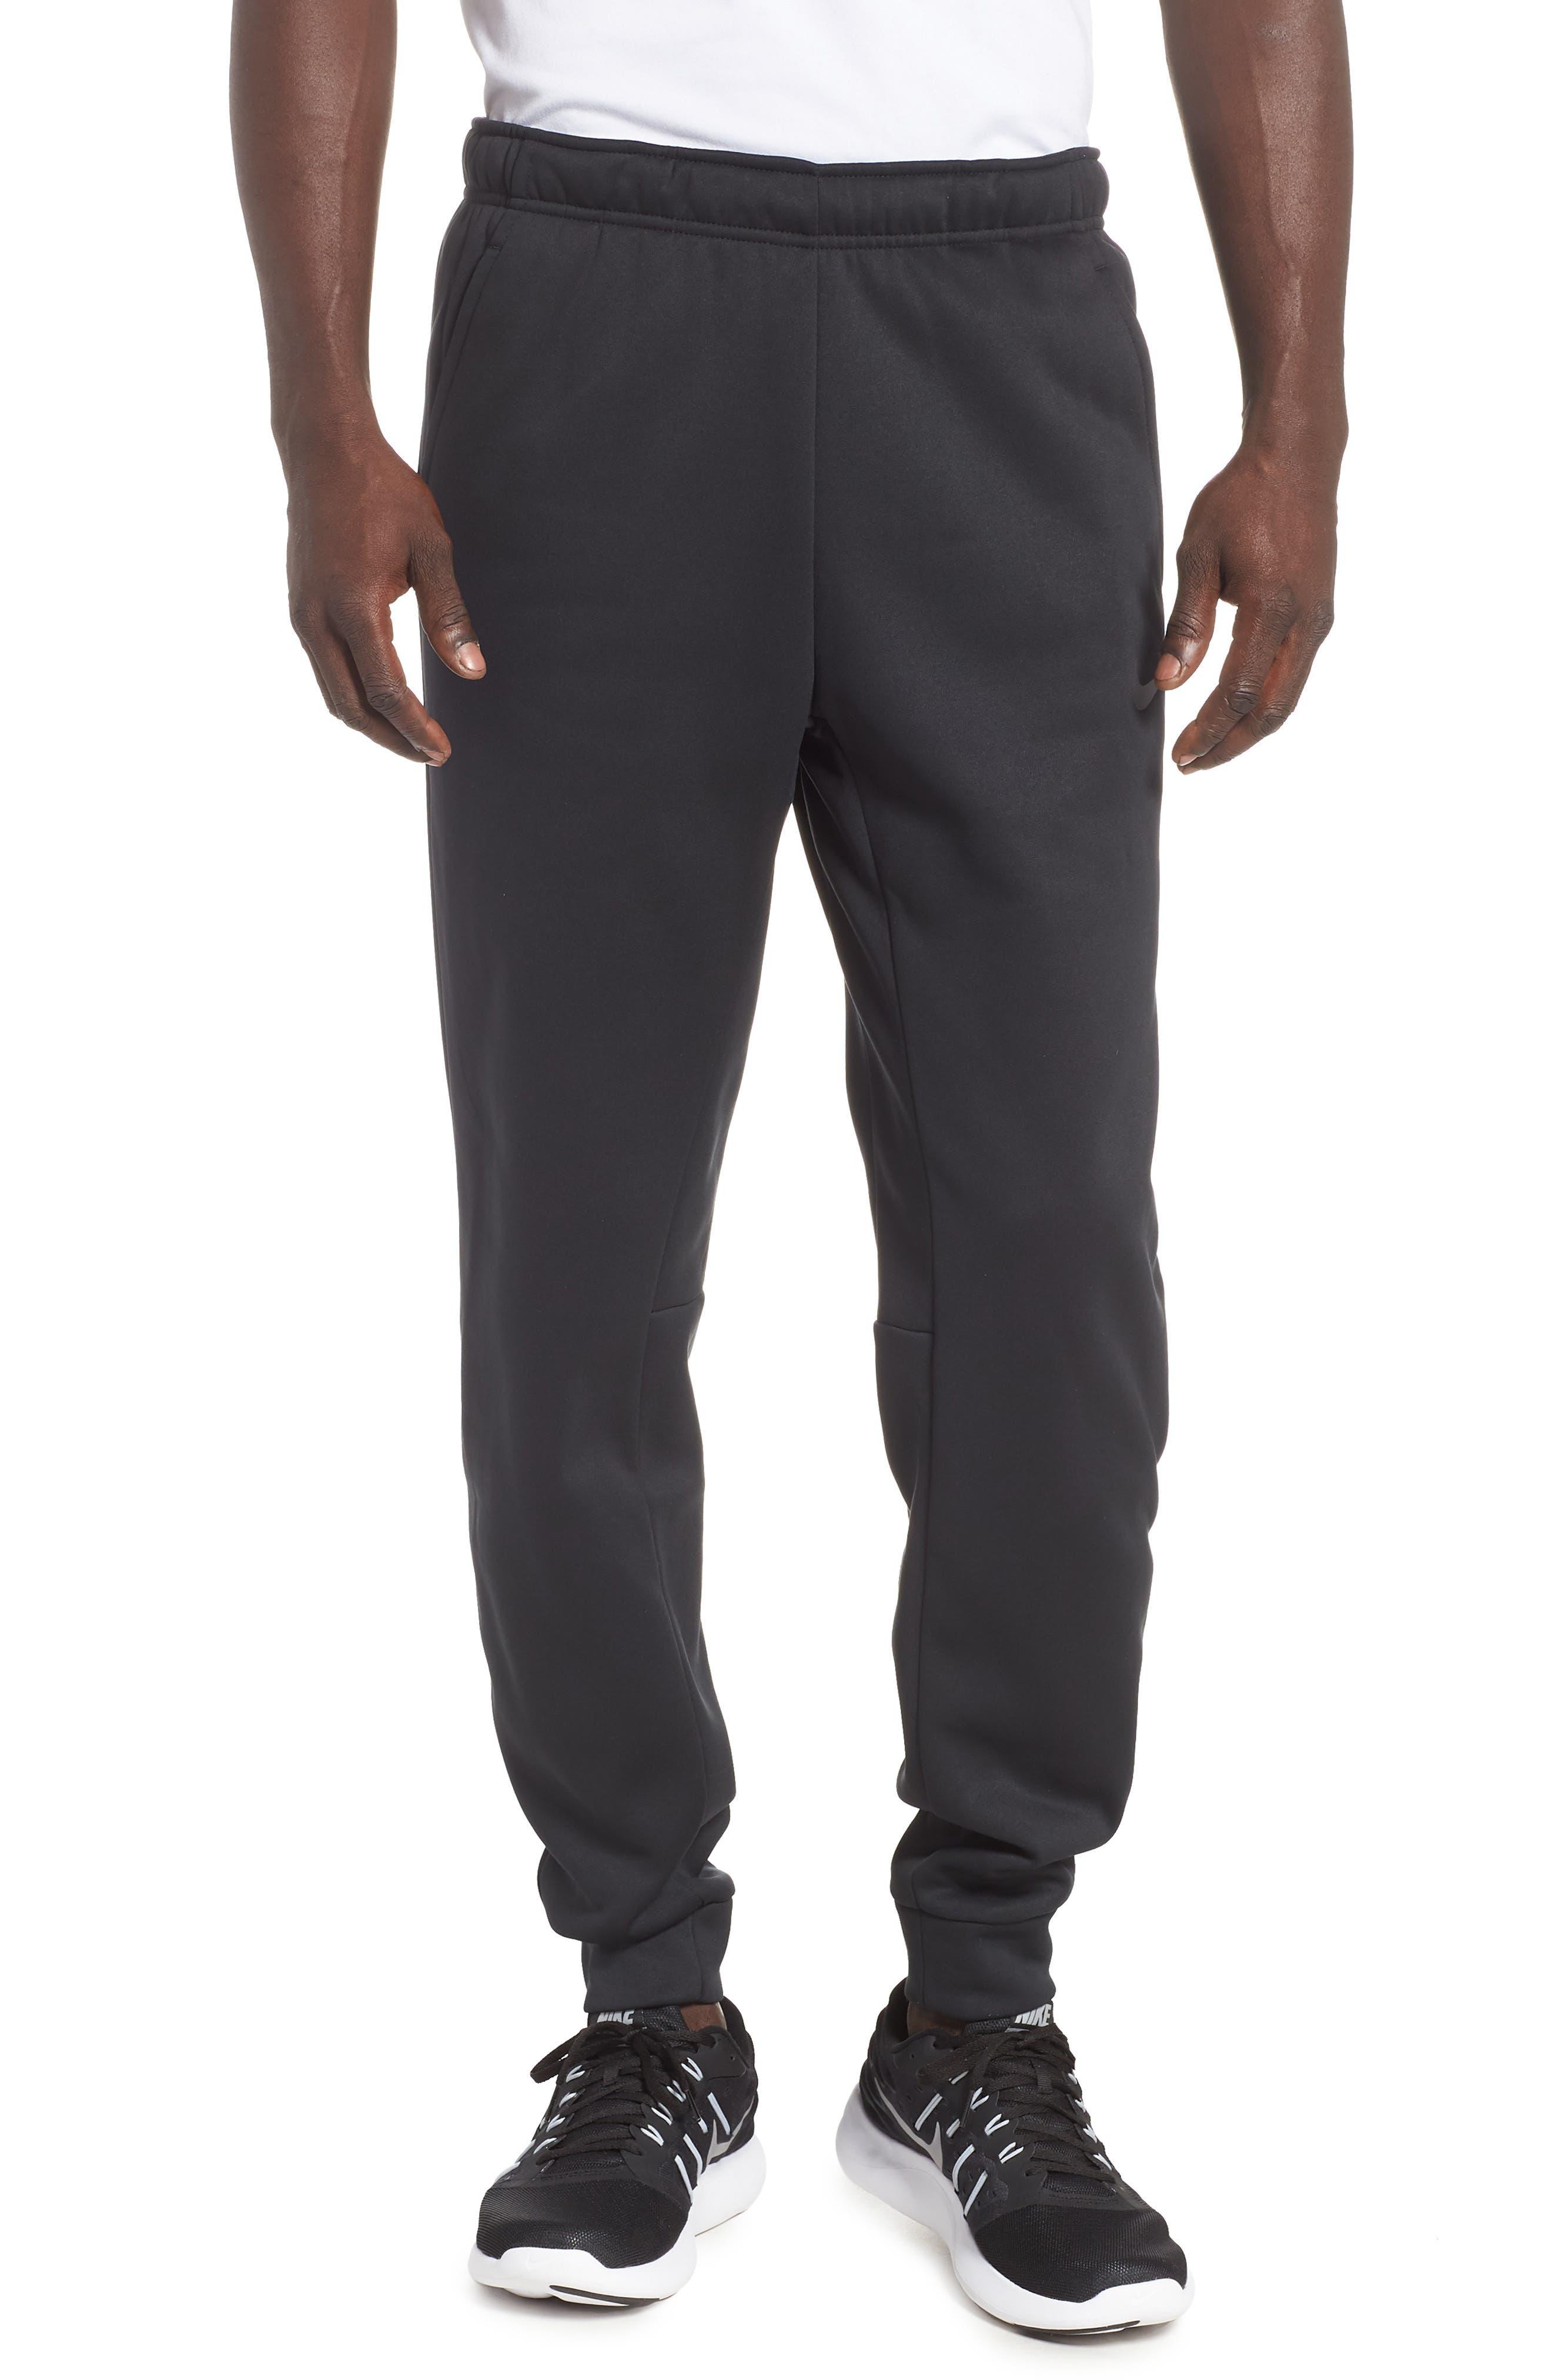 Dri-FIT Therma Training Pants,                         Main,                         color, BLACK/ METALLIC HEMATITE